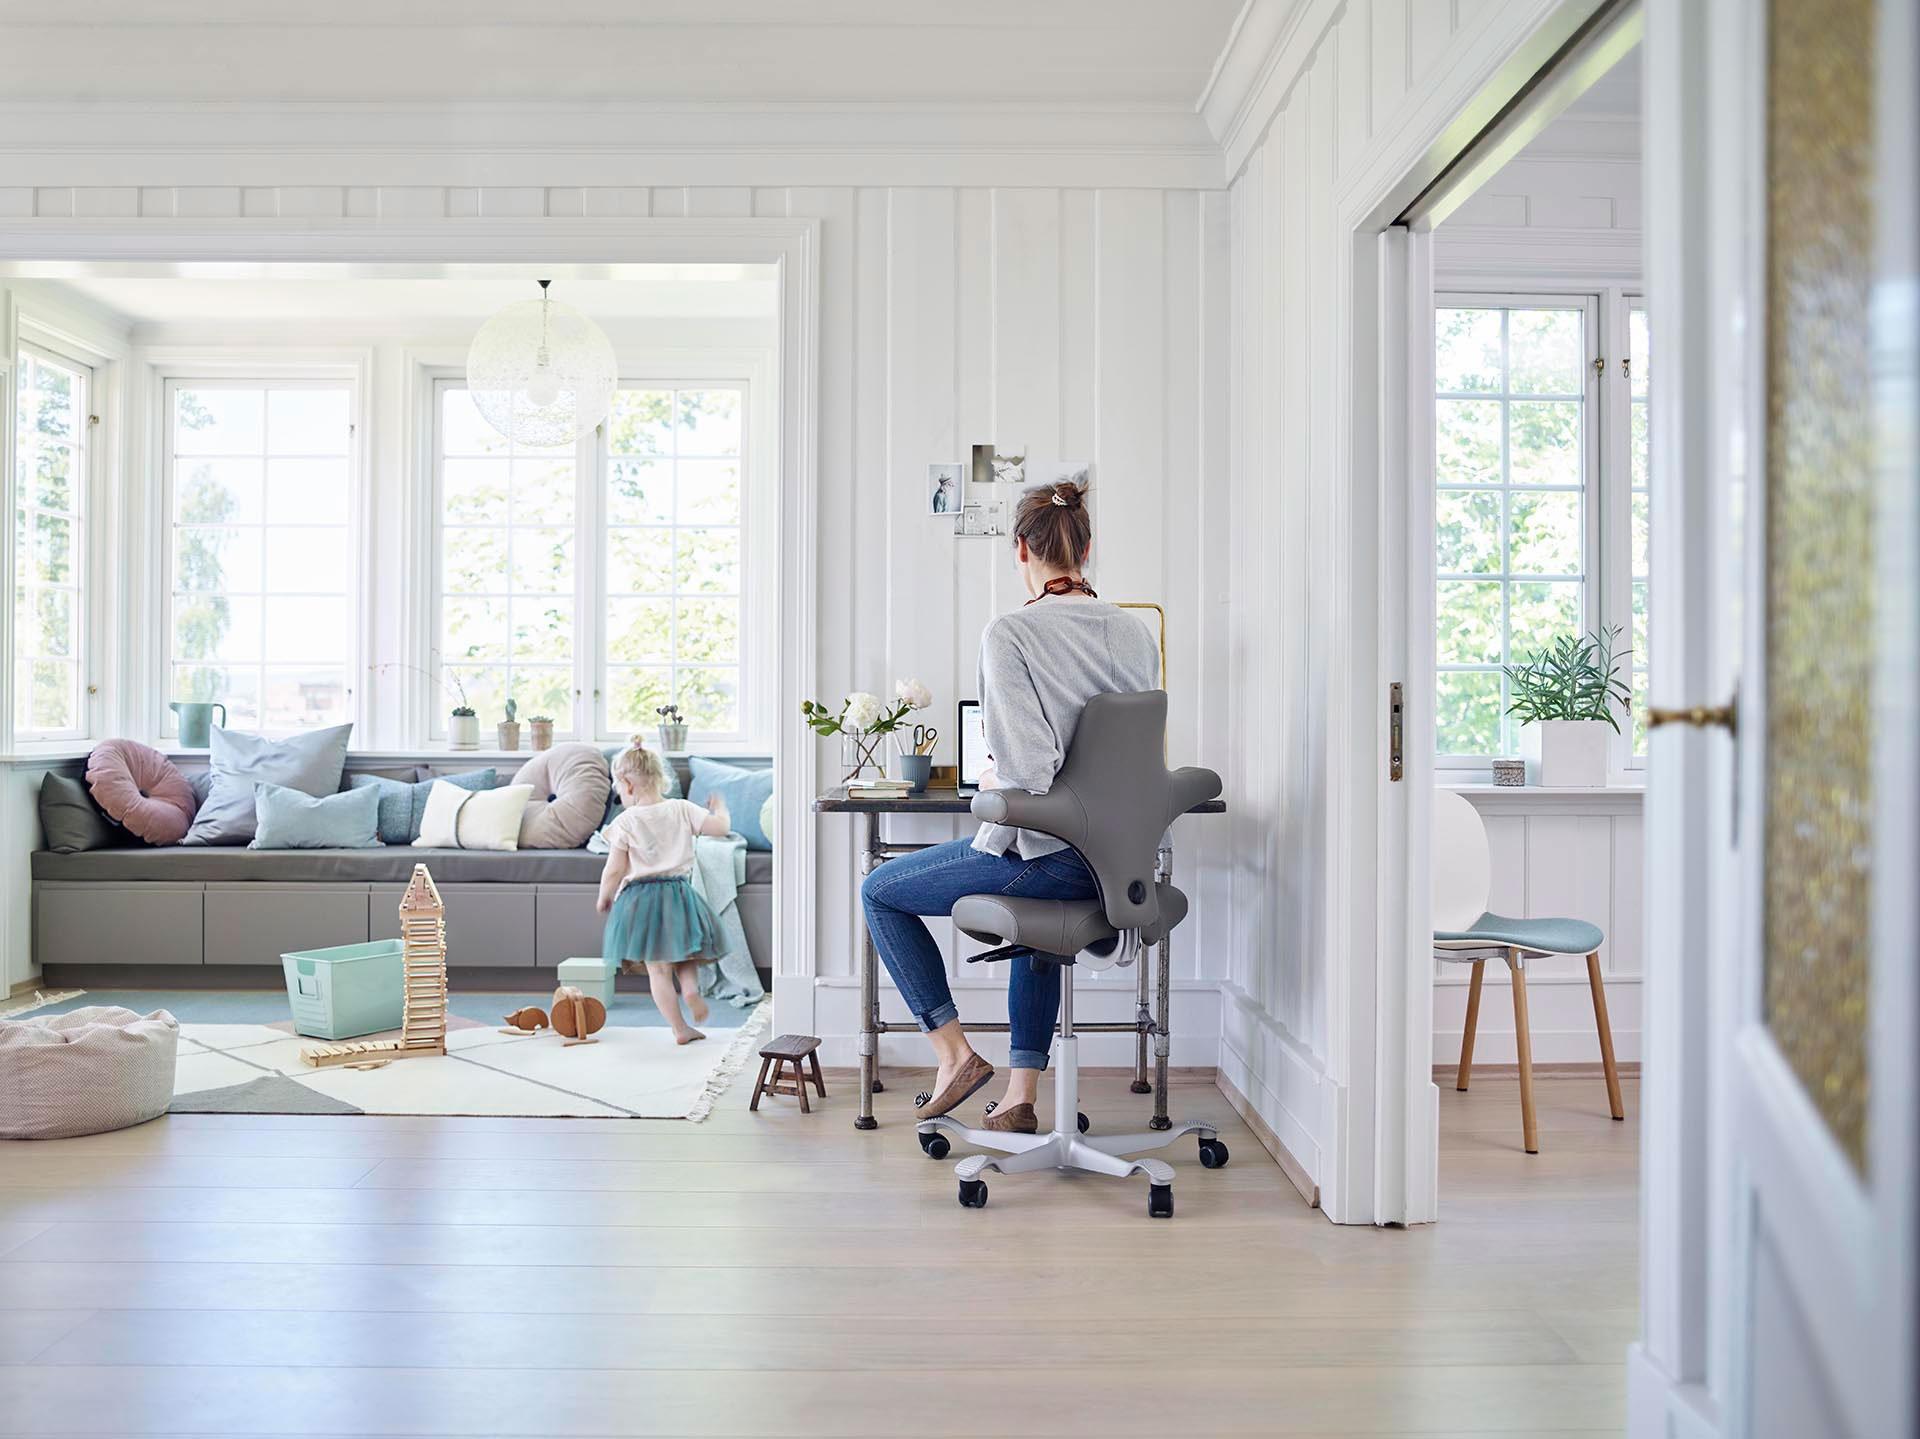 HAG Capisco 8106 ergonomisch Stuhl Bürostuhl Home Office